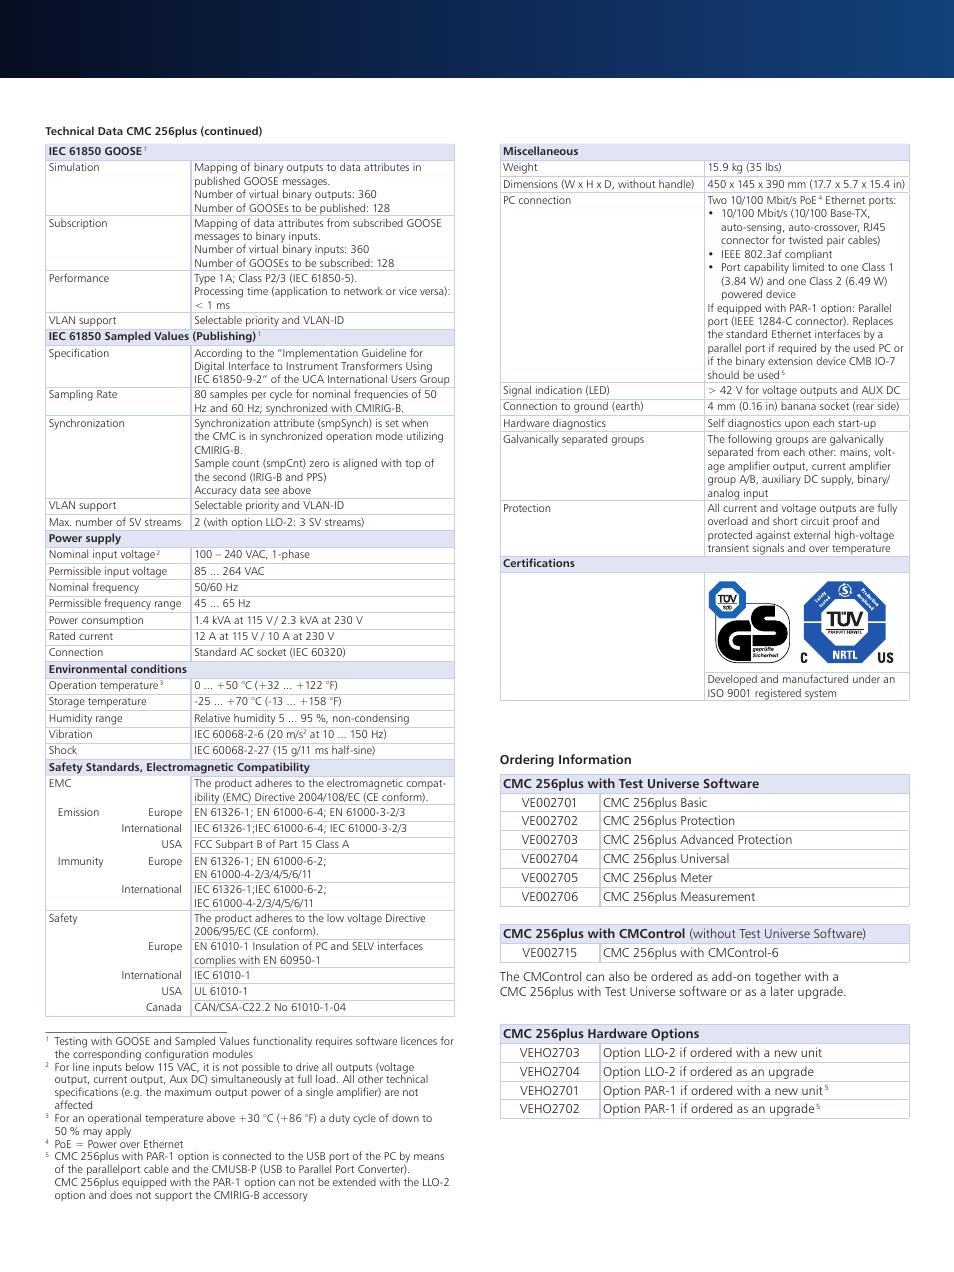 atec omicron cmc 256 plus user manual page 3 3 original mode rh manualsdir com Maintenance Manual Maintenance Manual